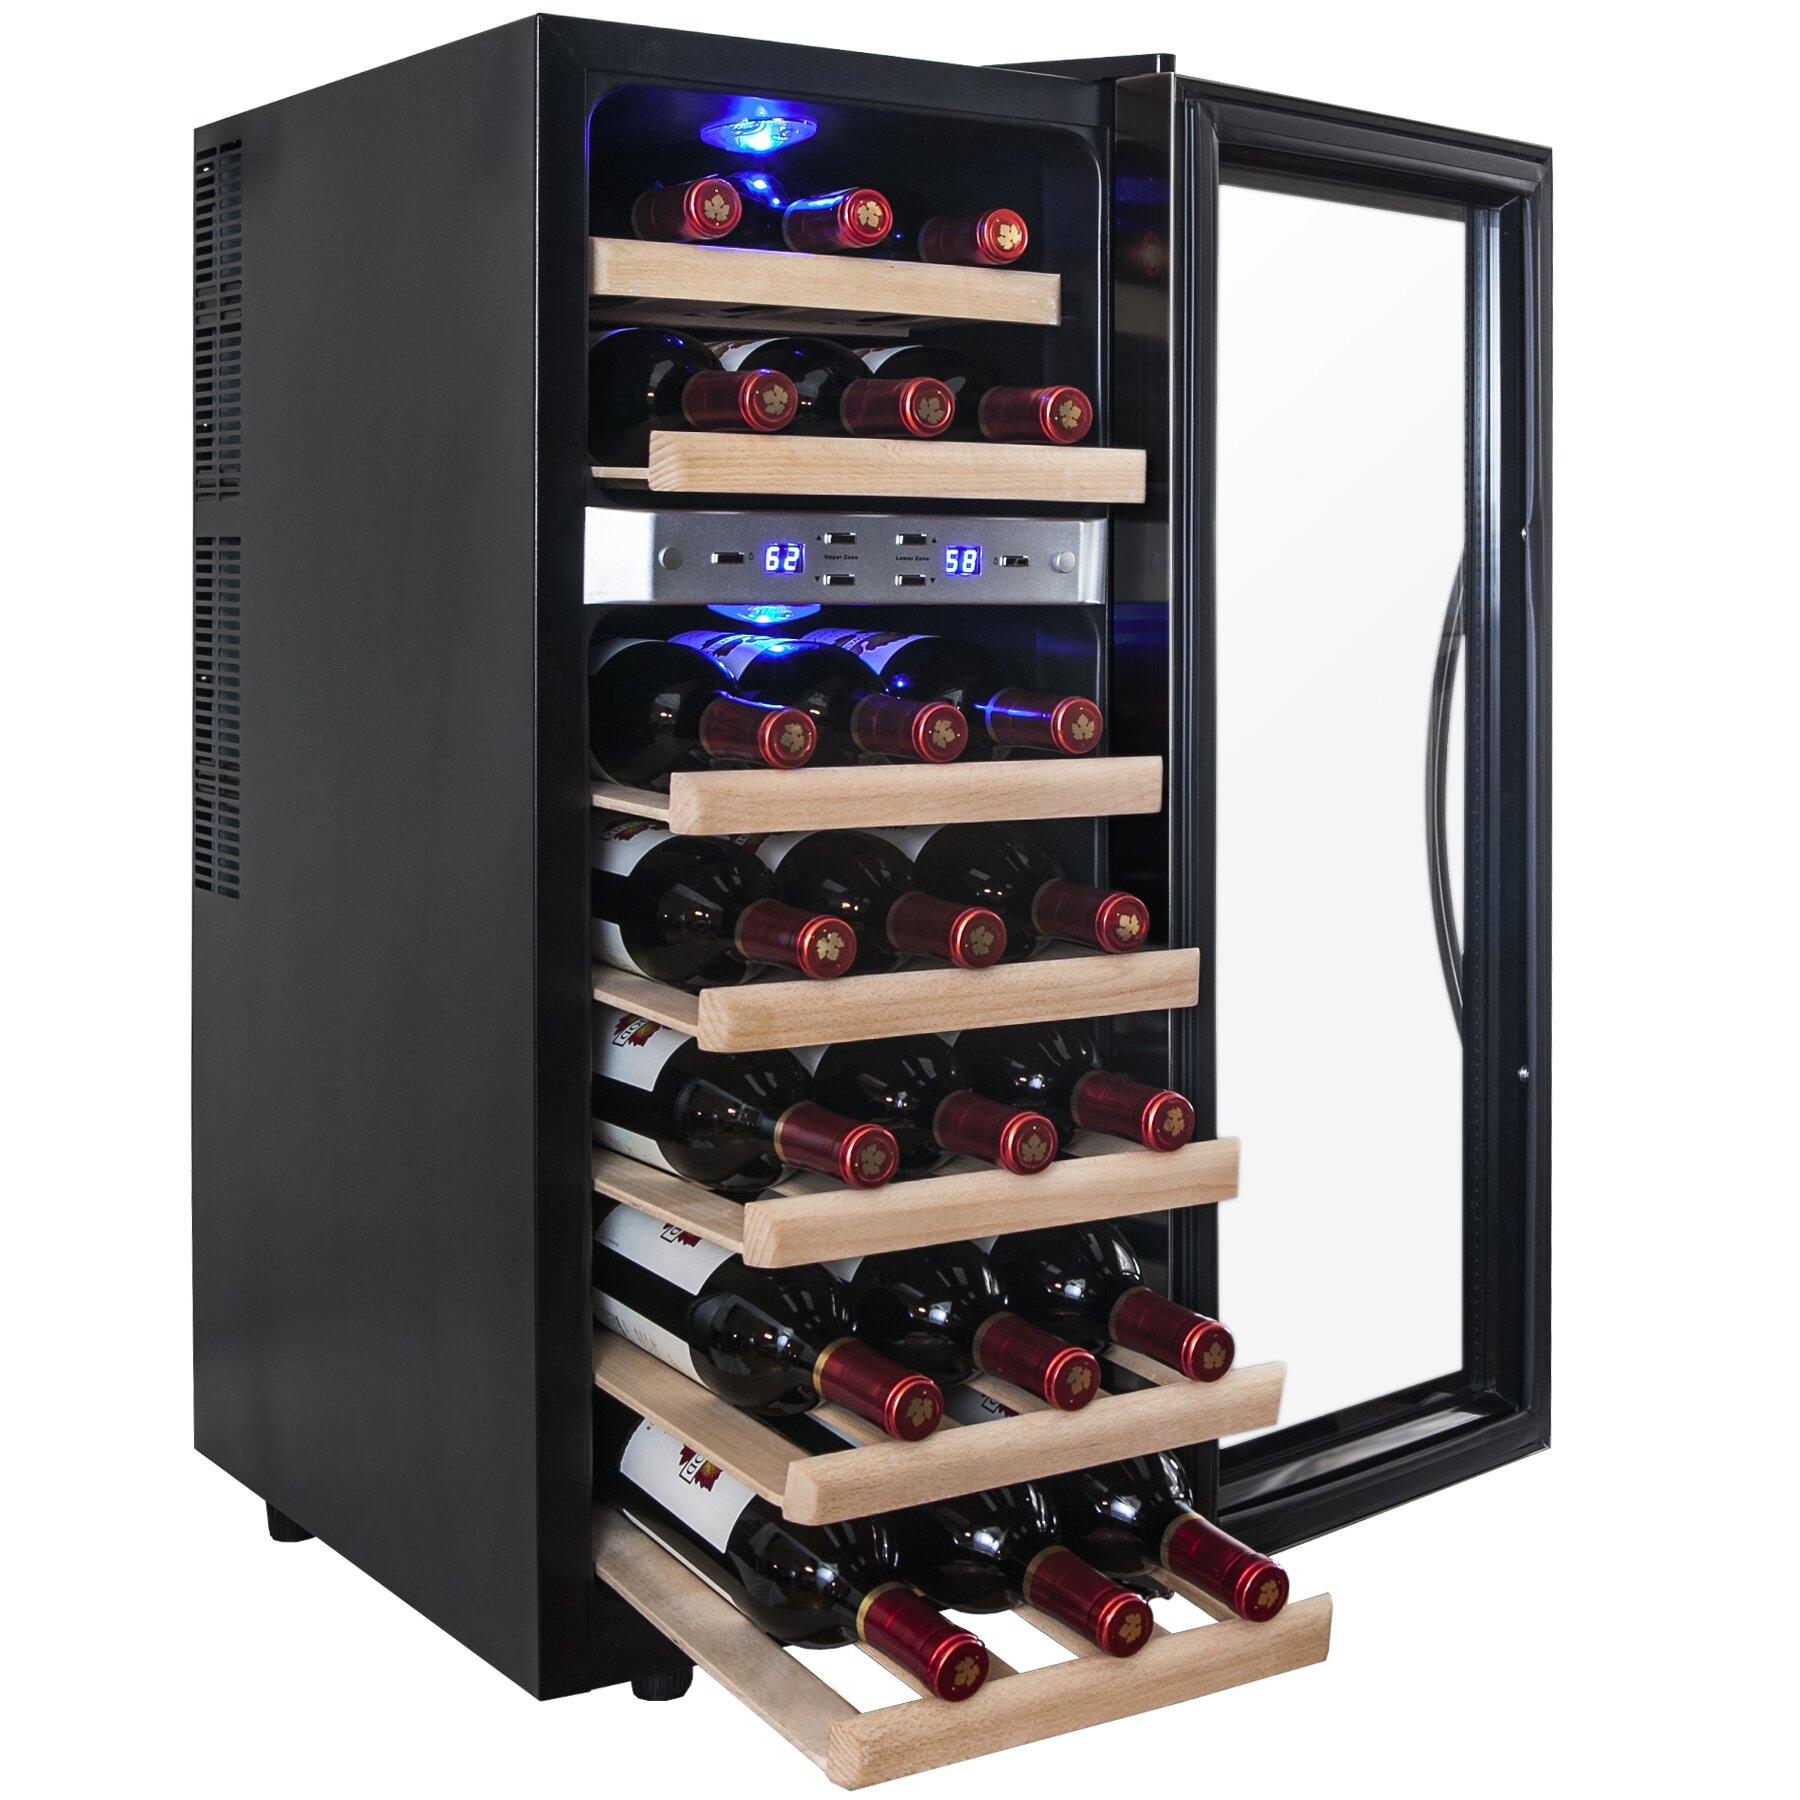 Akdy 21 Bottle Dual Zone Freestanding Wine Refrigerator